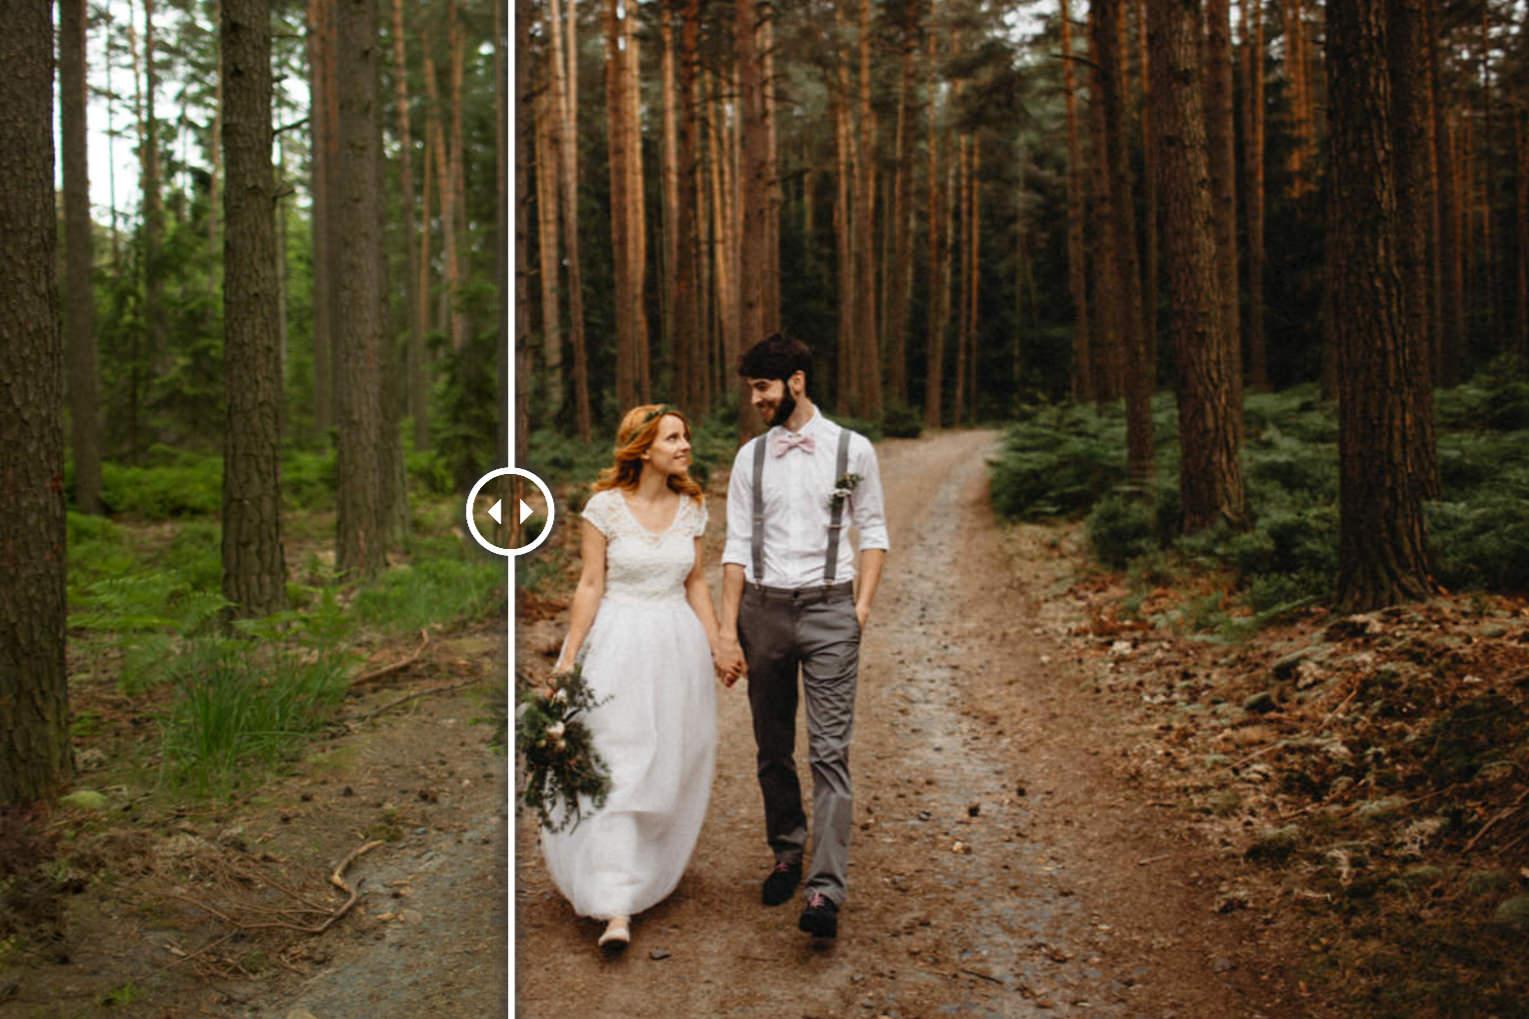 wedding-photography-editing-tips.jpg